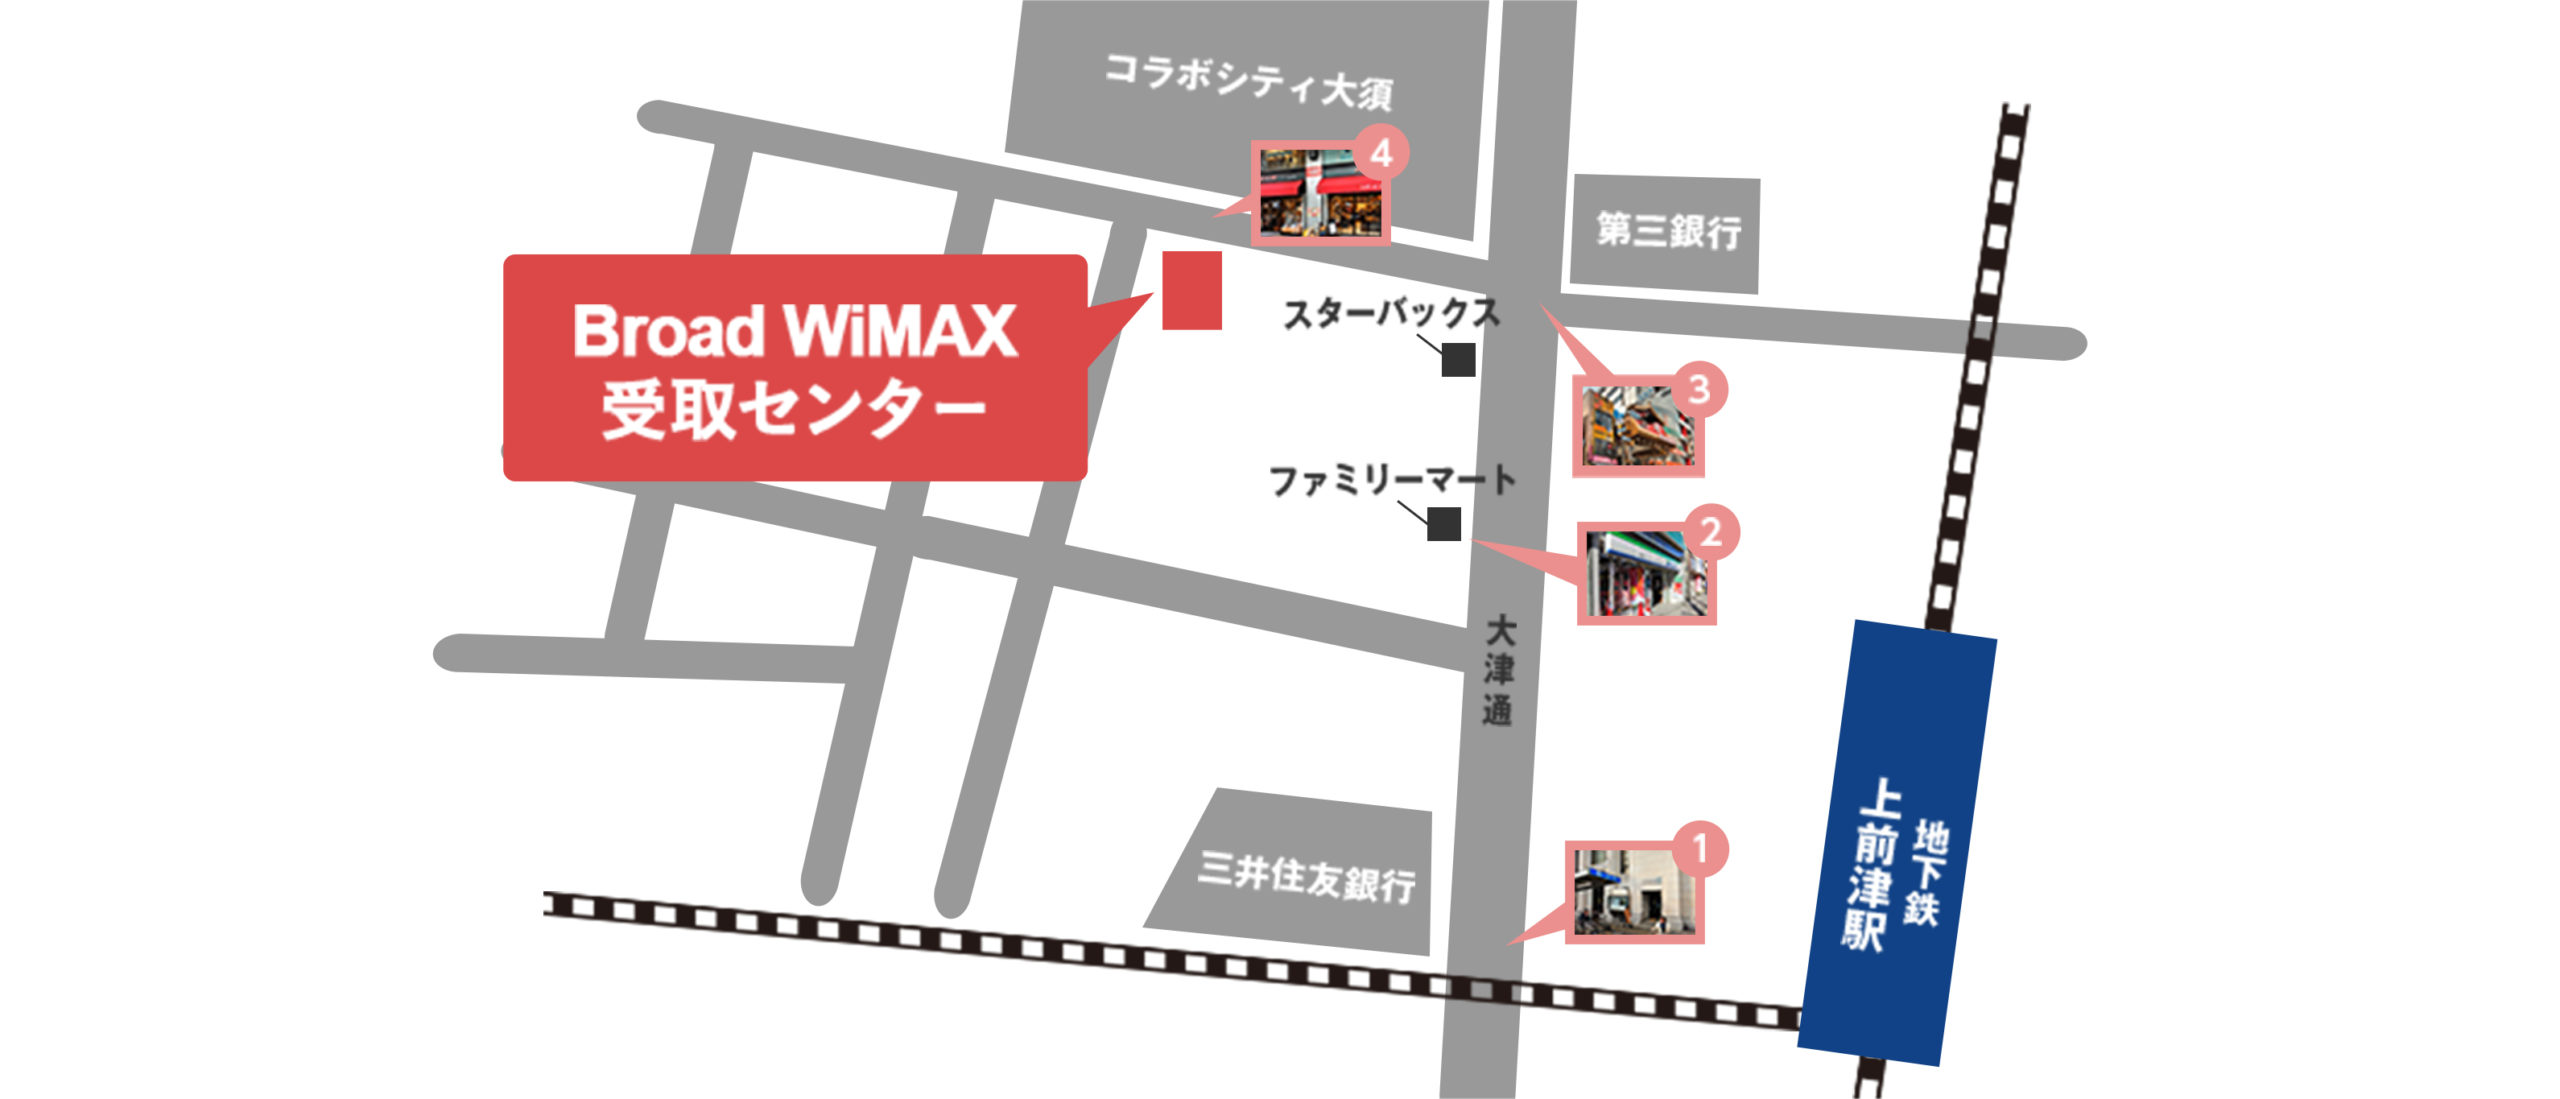 BroadWiMAX 名古屋の受け取り場所